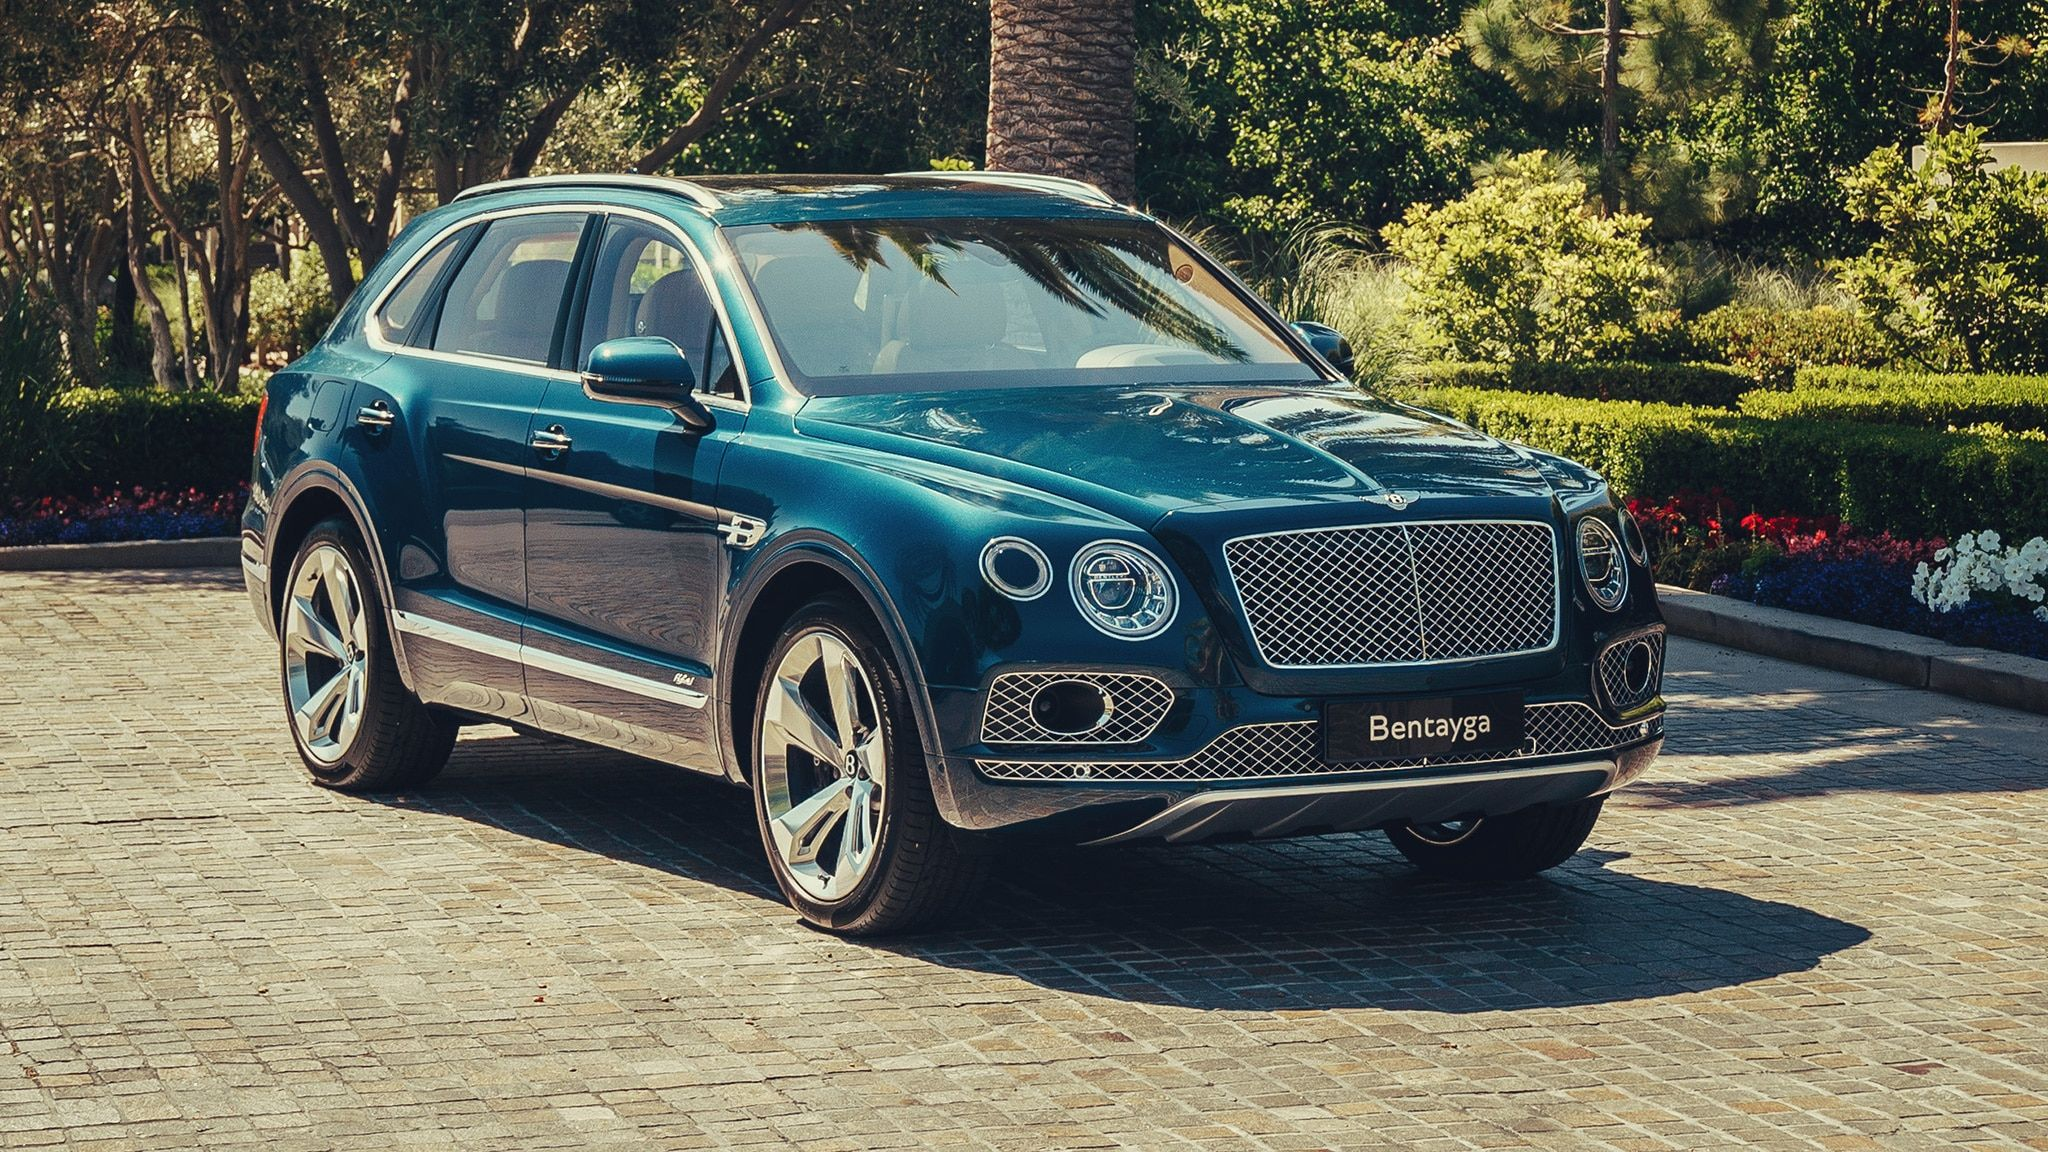 2020 Bentley Bentayga Hybrid Owners Manual Owners Manuals Manual Bentley